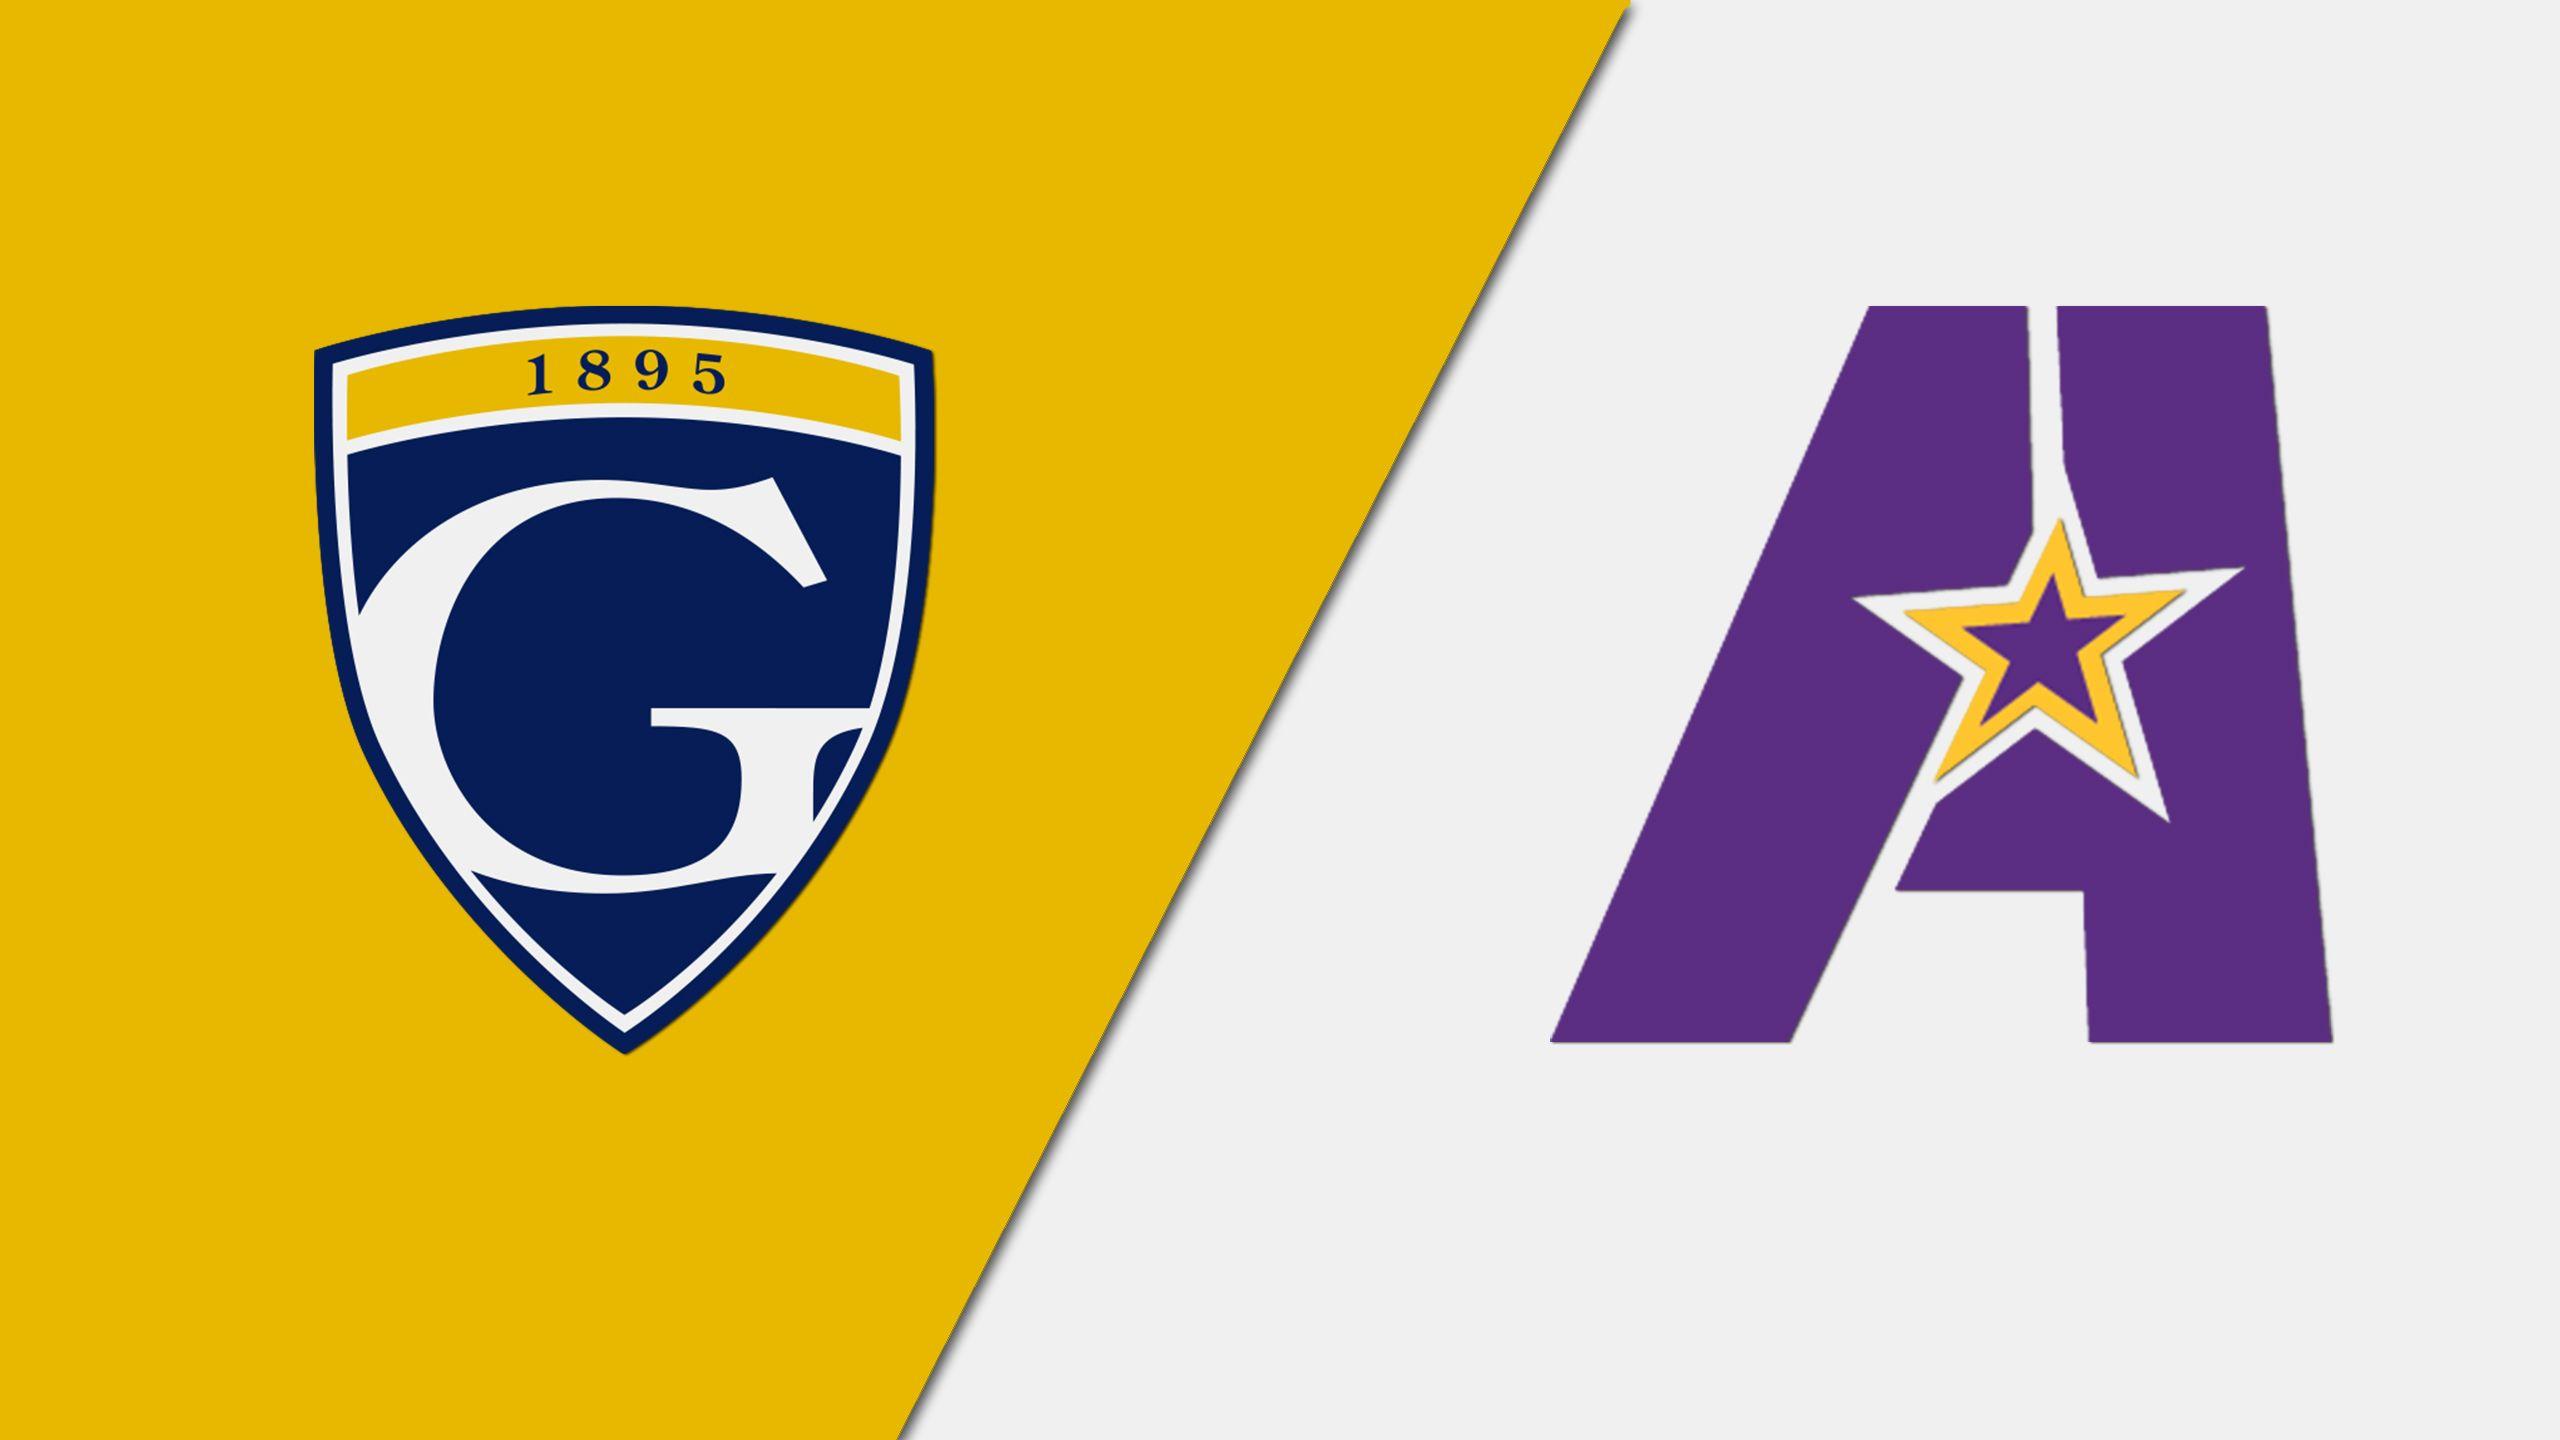 Graceland vs. LSU Alexandria (Championship) (NAIA DI Men's Basketball Championship)